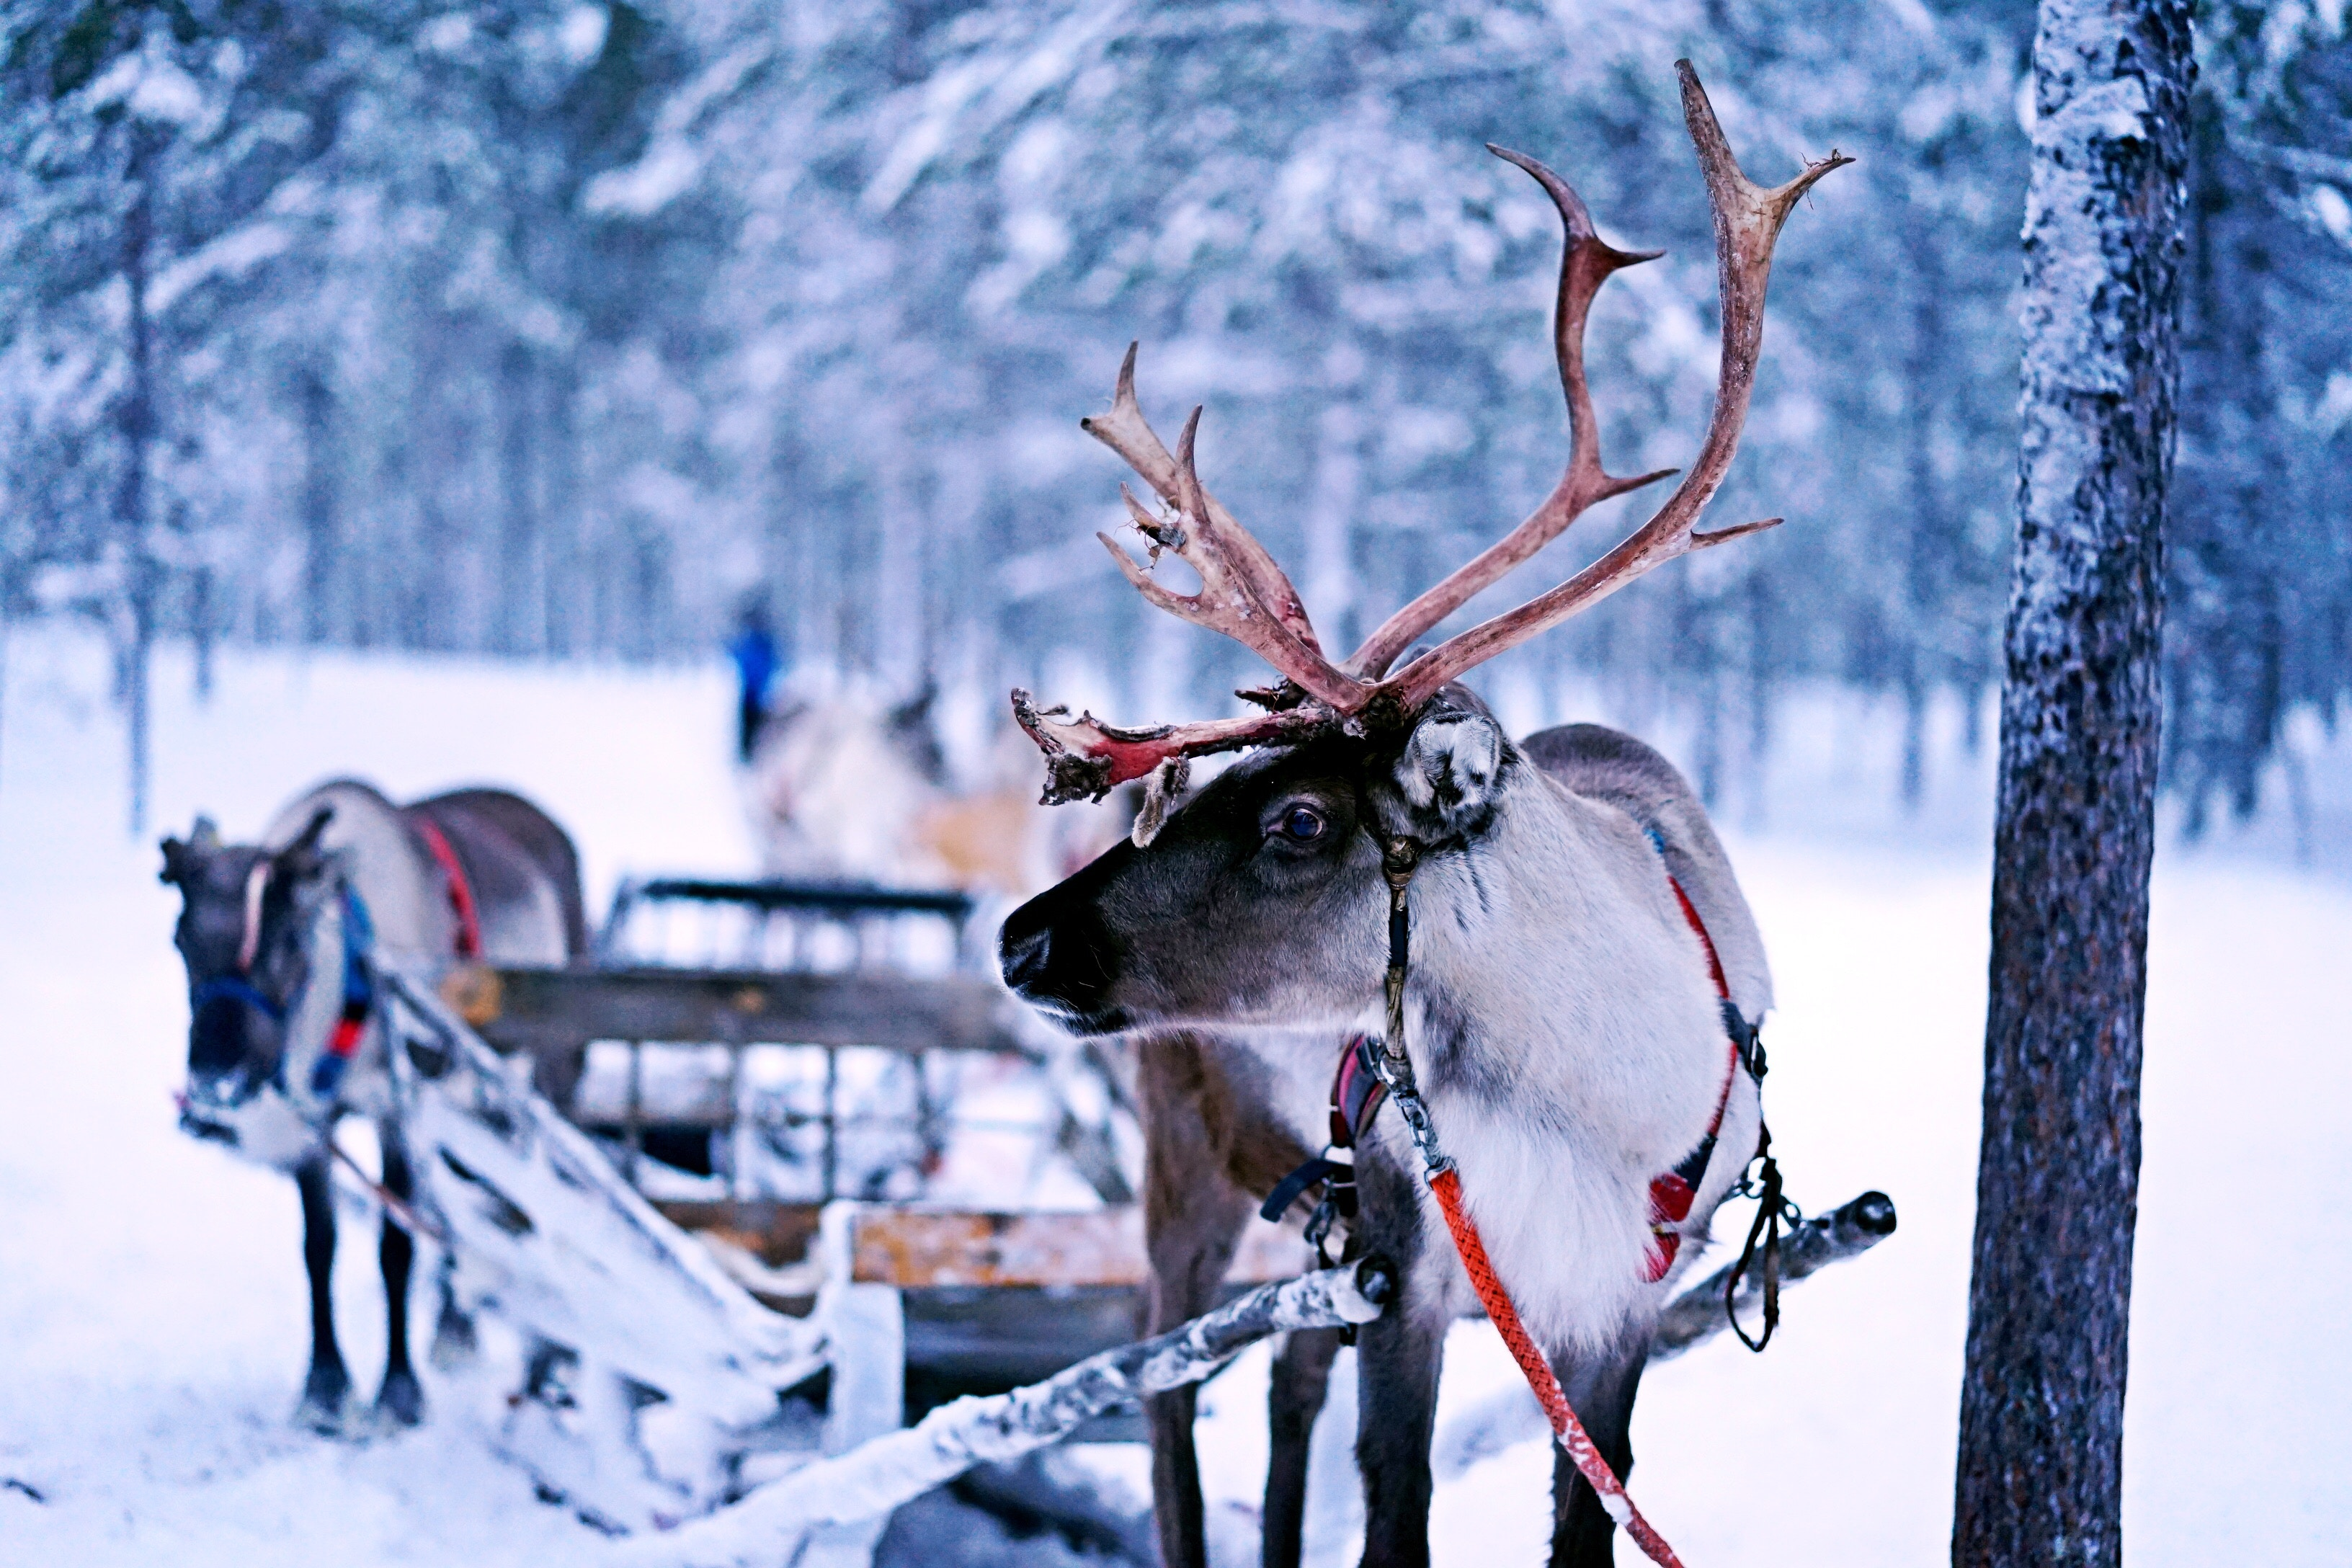 open company in Finland